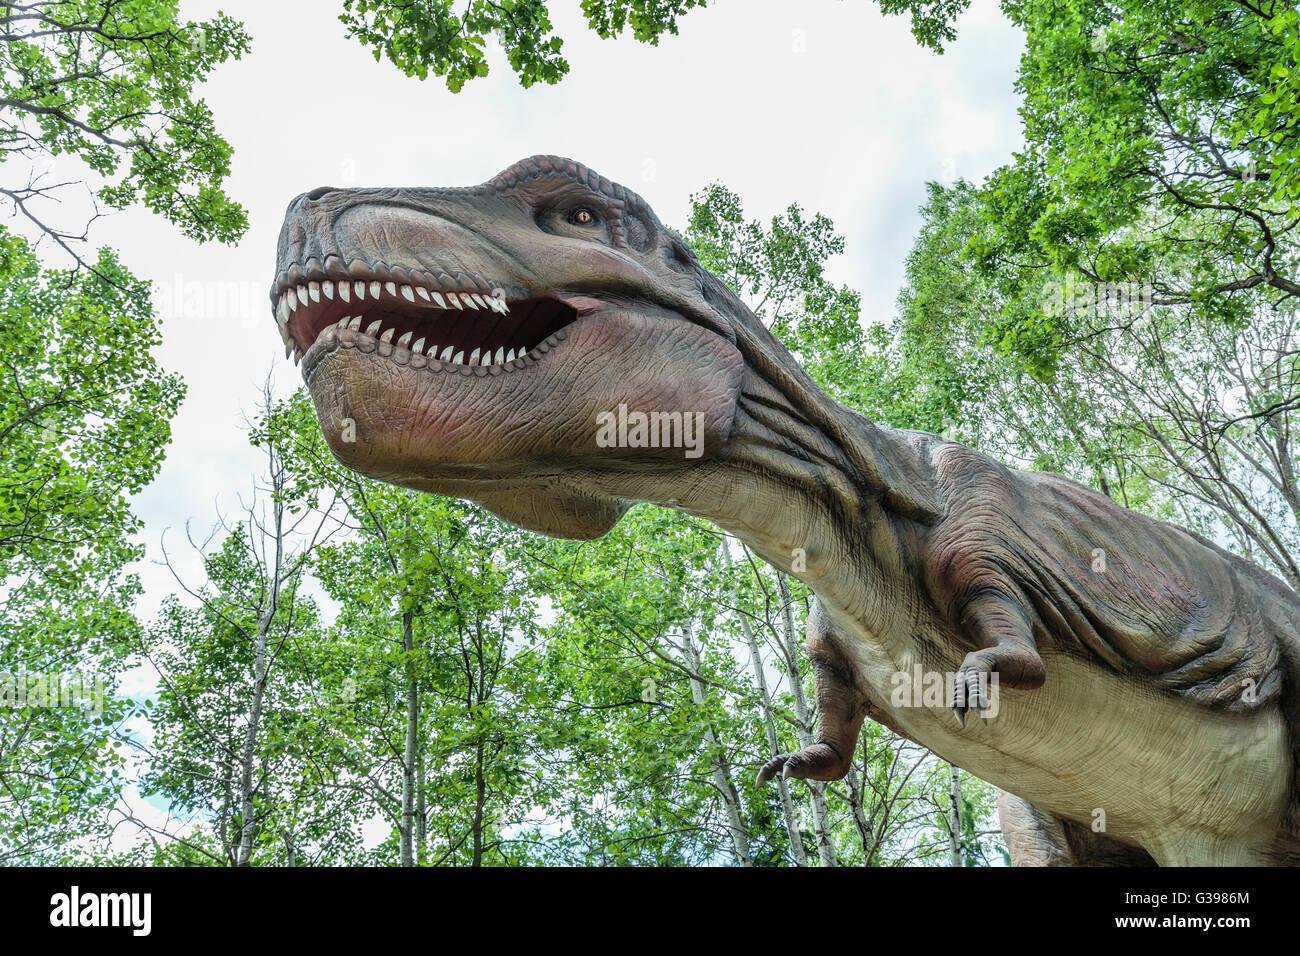 Tyrannosaurus Rex at Dinosaurs Alive - Stock Image